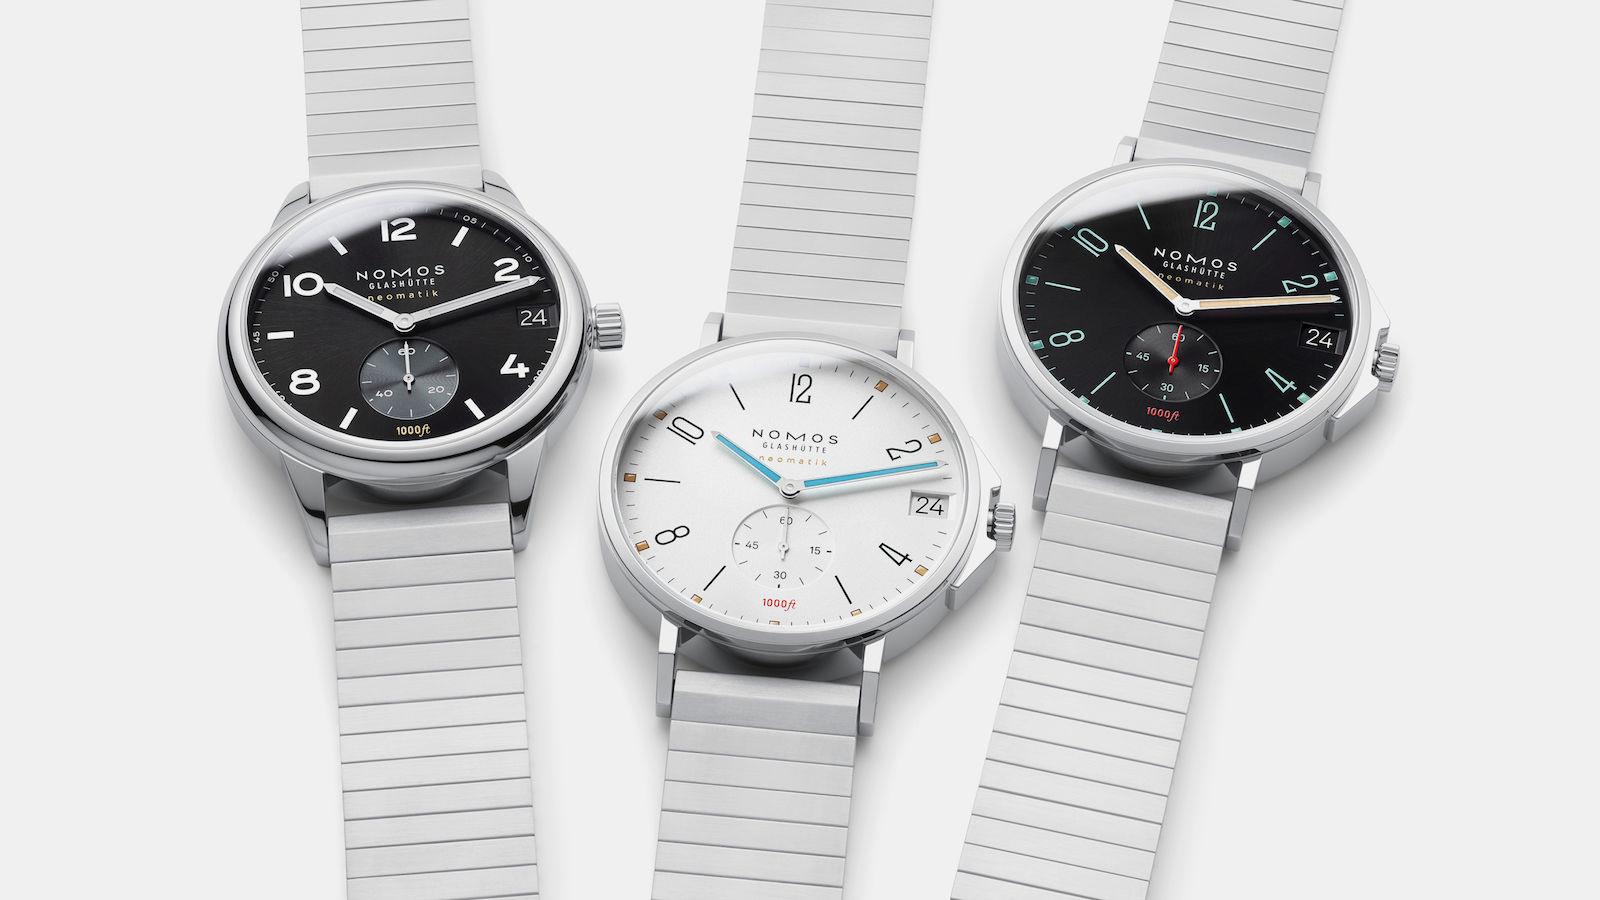 NOMOS Sport Watches